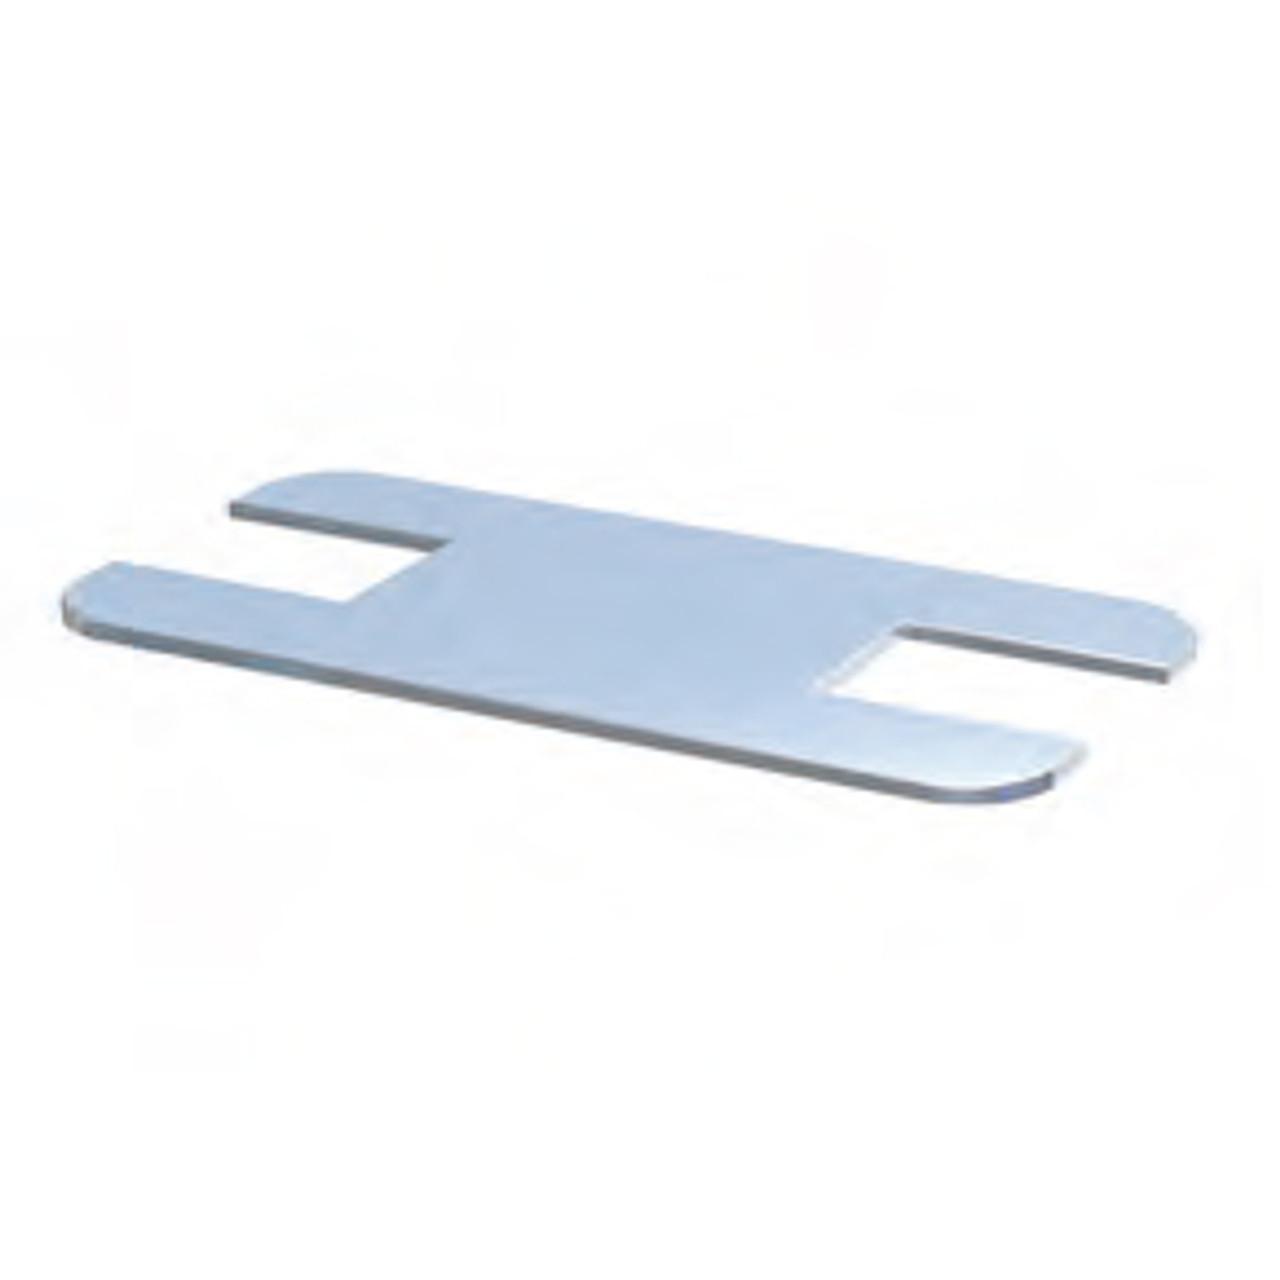 LP4316 Locking Plate